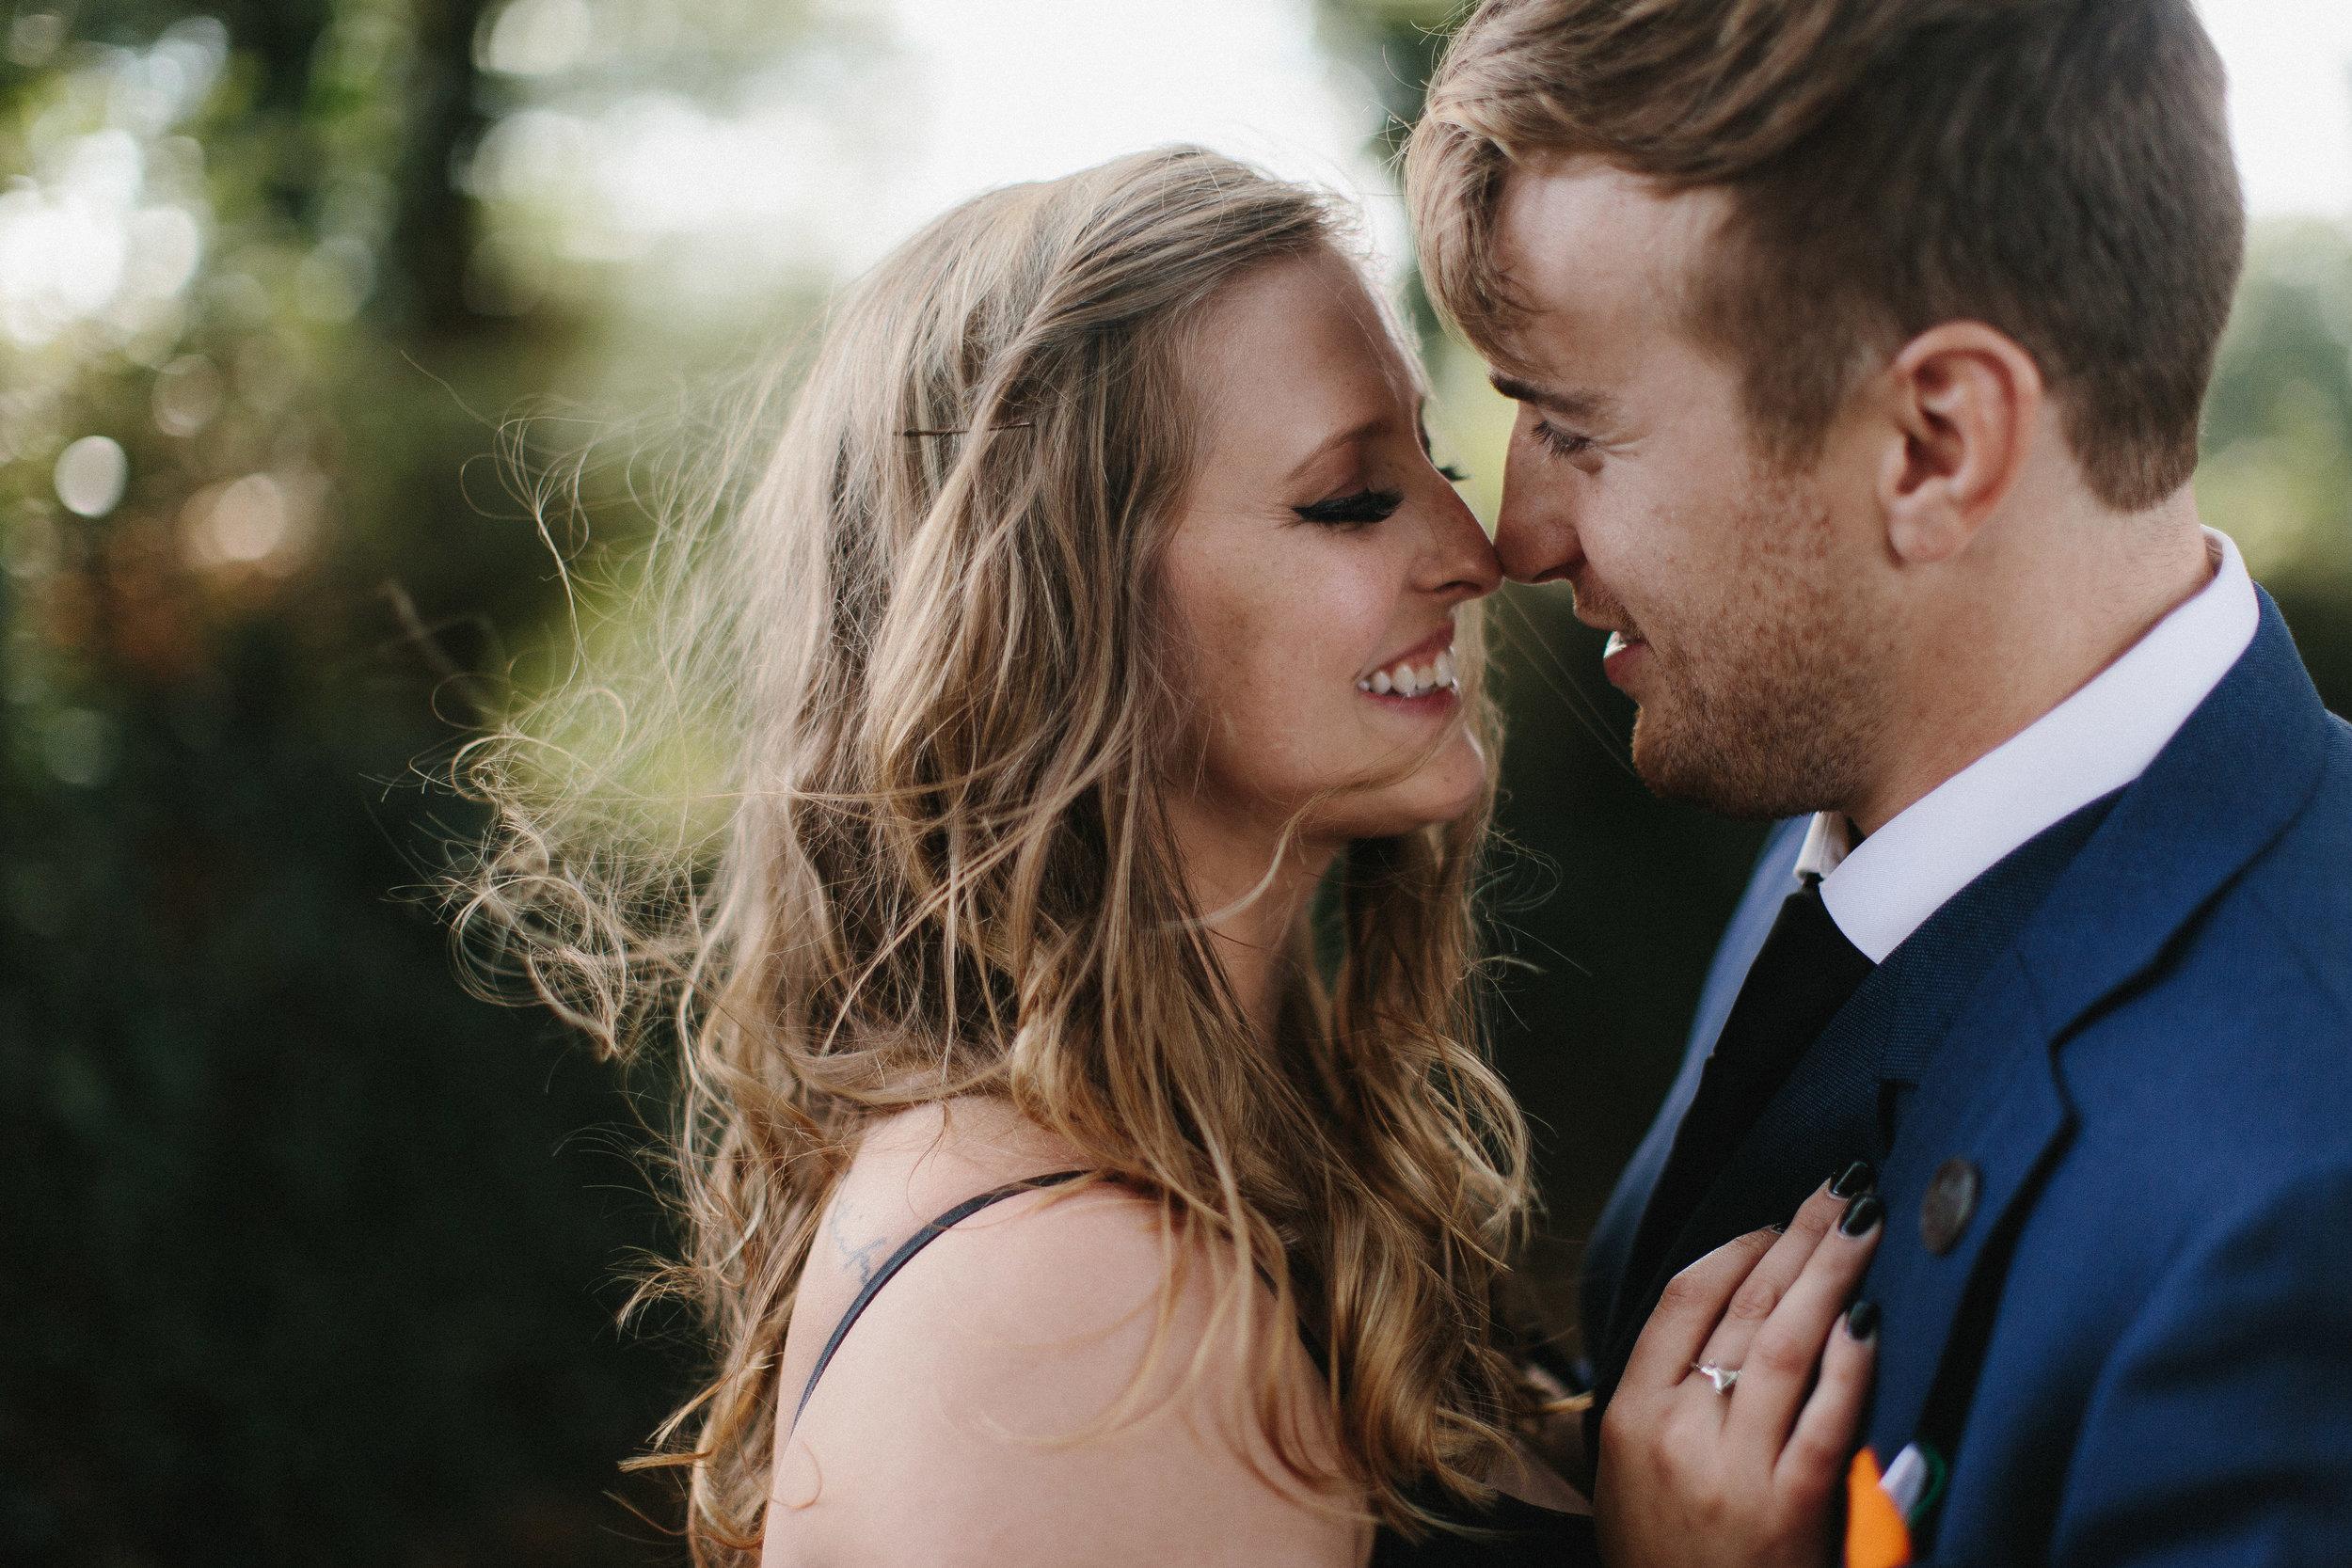 ireland_elopement_black_wedding_dress_wicklow_glendalough_athy_st_kevins_way_1708.jpg